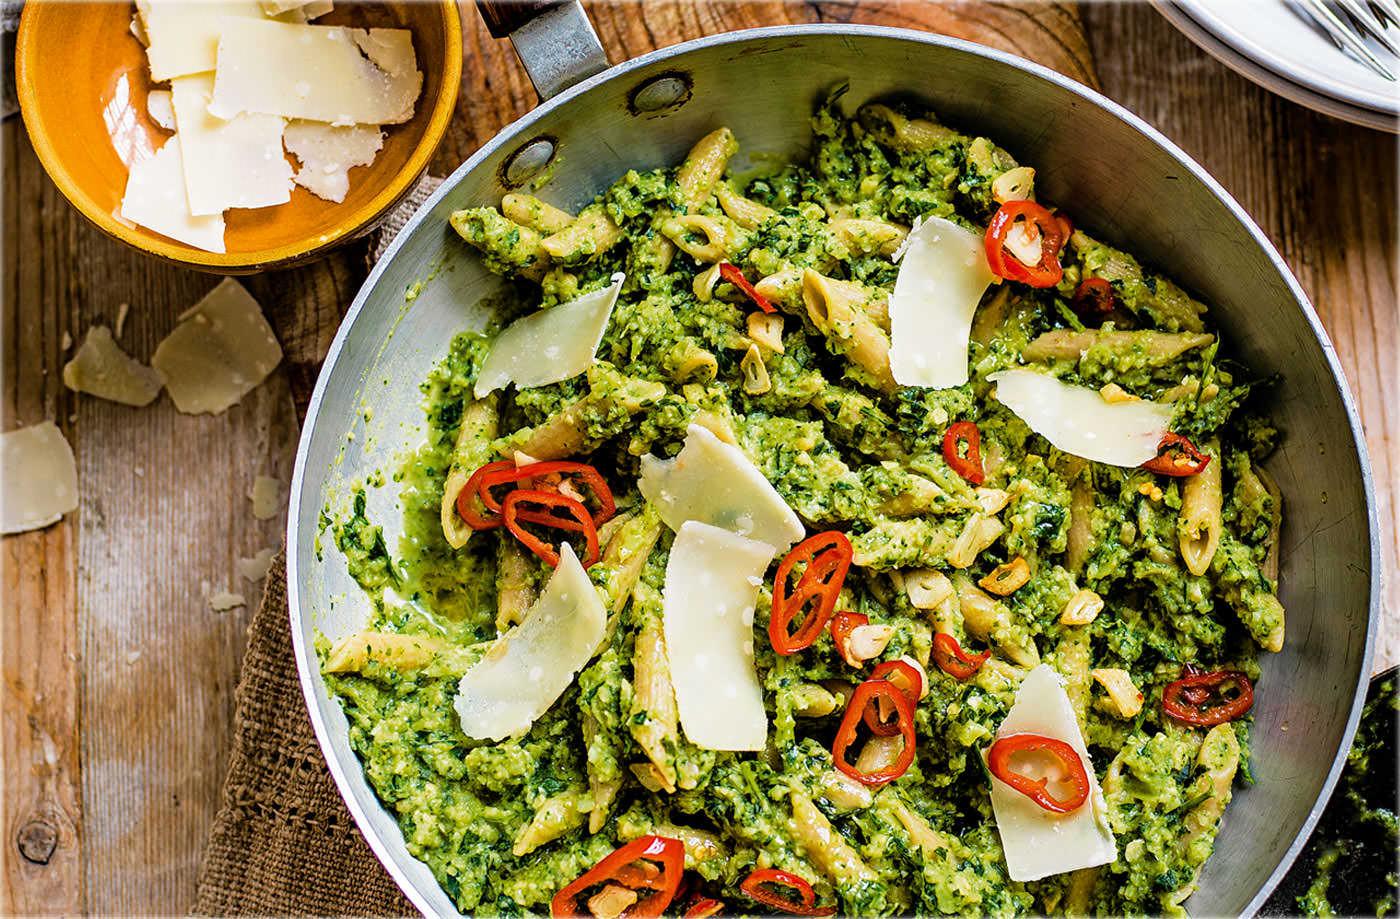 Healthy Vegetarian Food Recipes  Healthy Ve arian Recipes Ve arian Meals